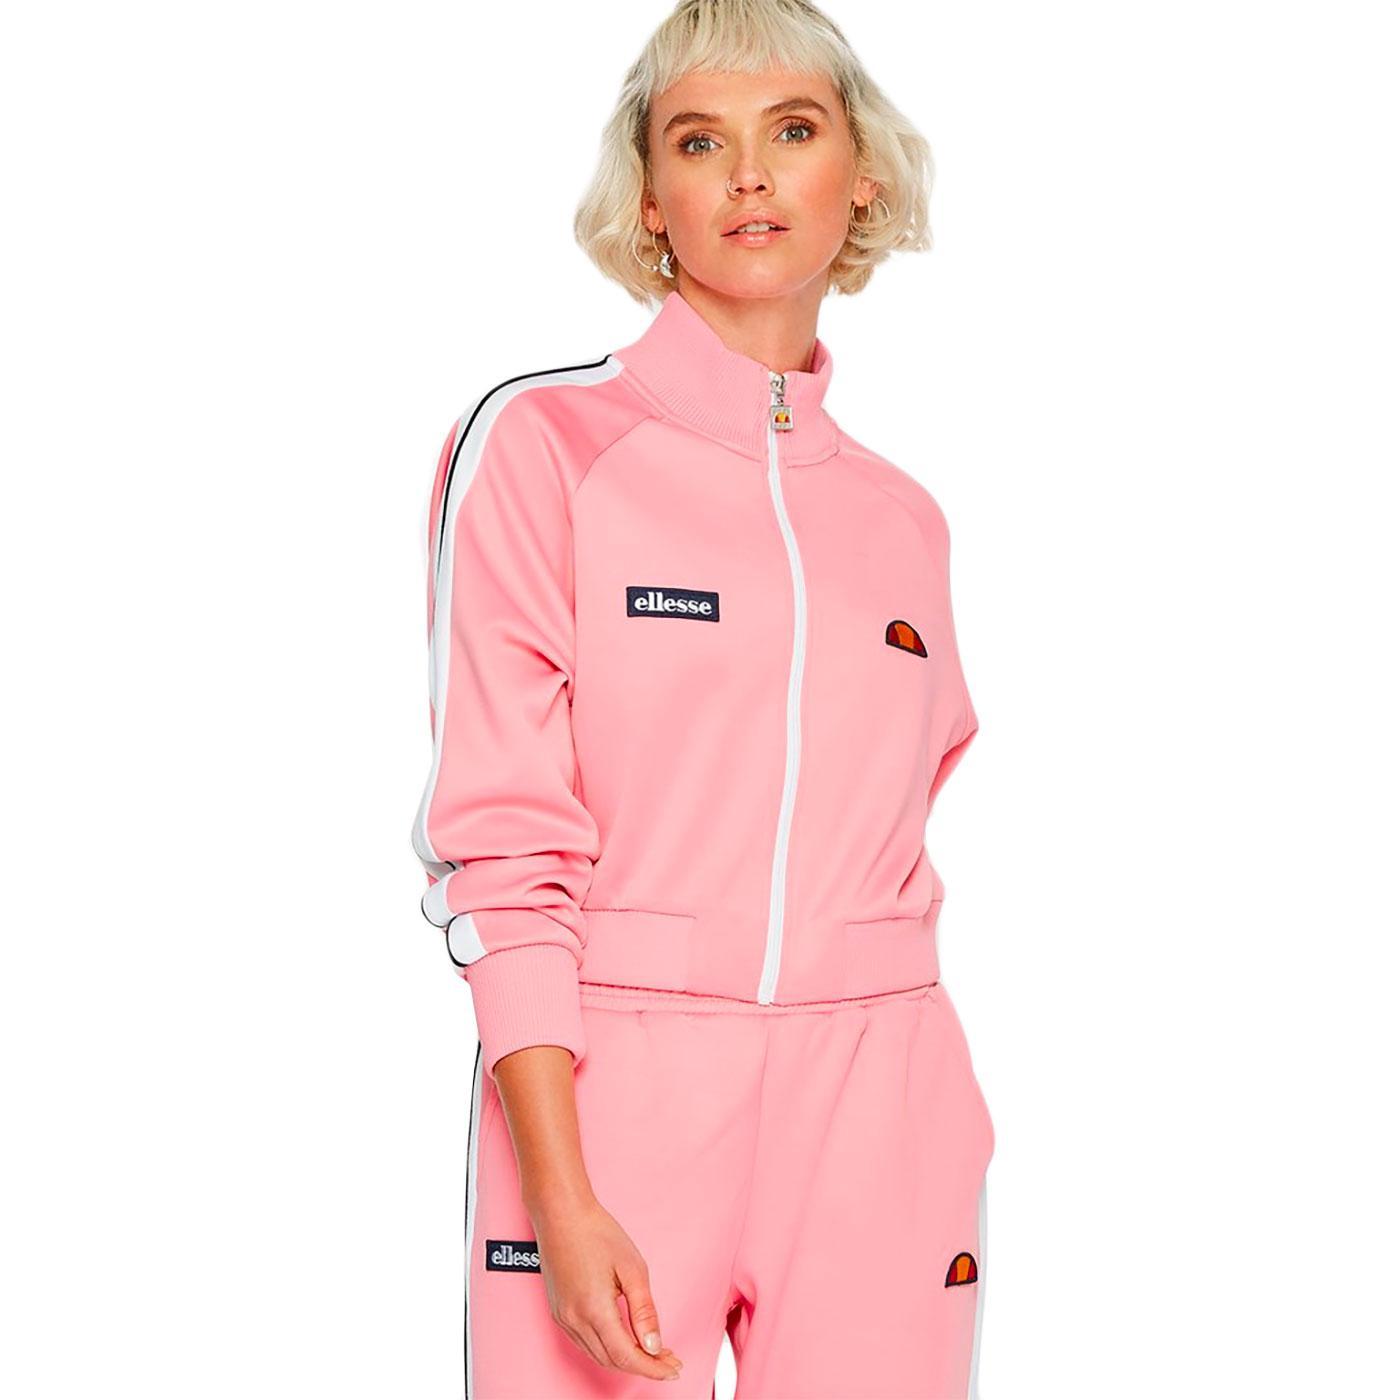 Pinzo ELLESSE Retro 1980s Crop Track Jacket (Pink)